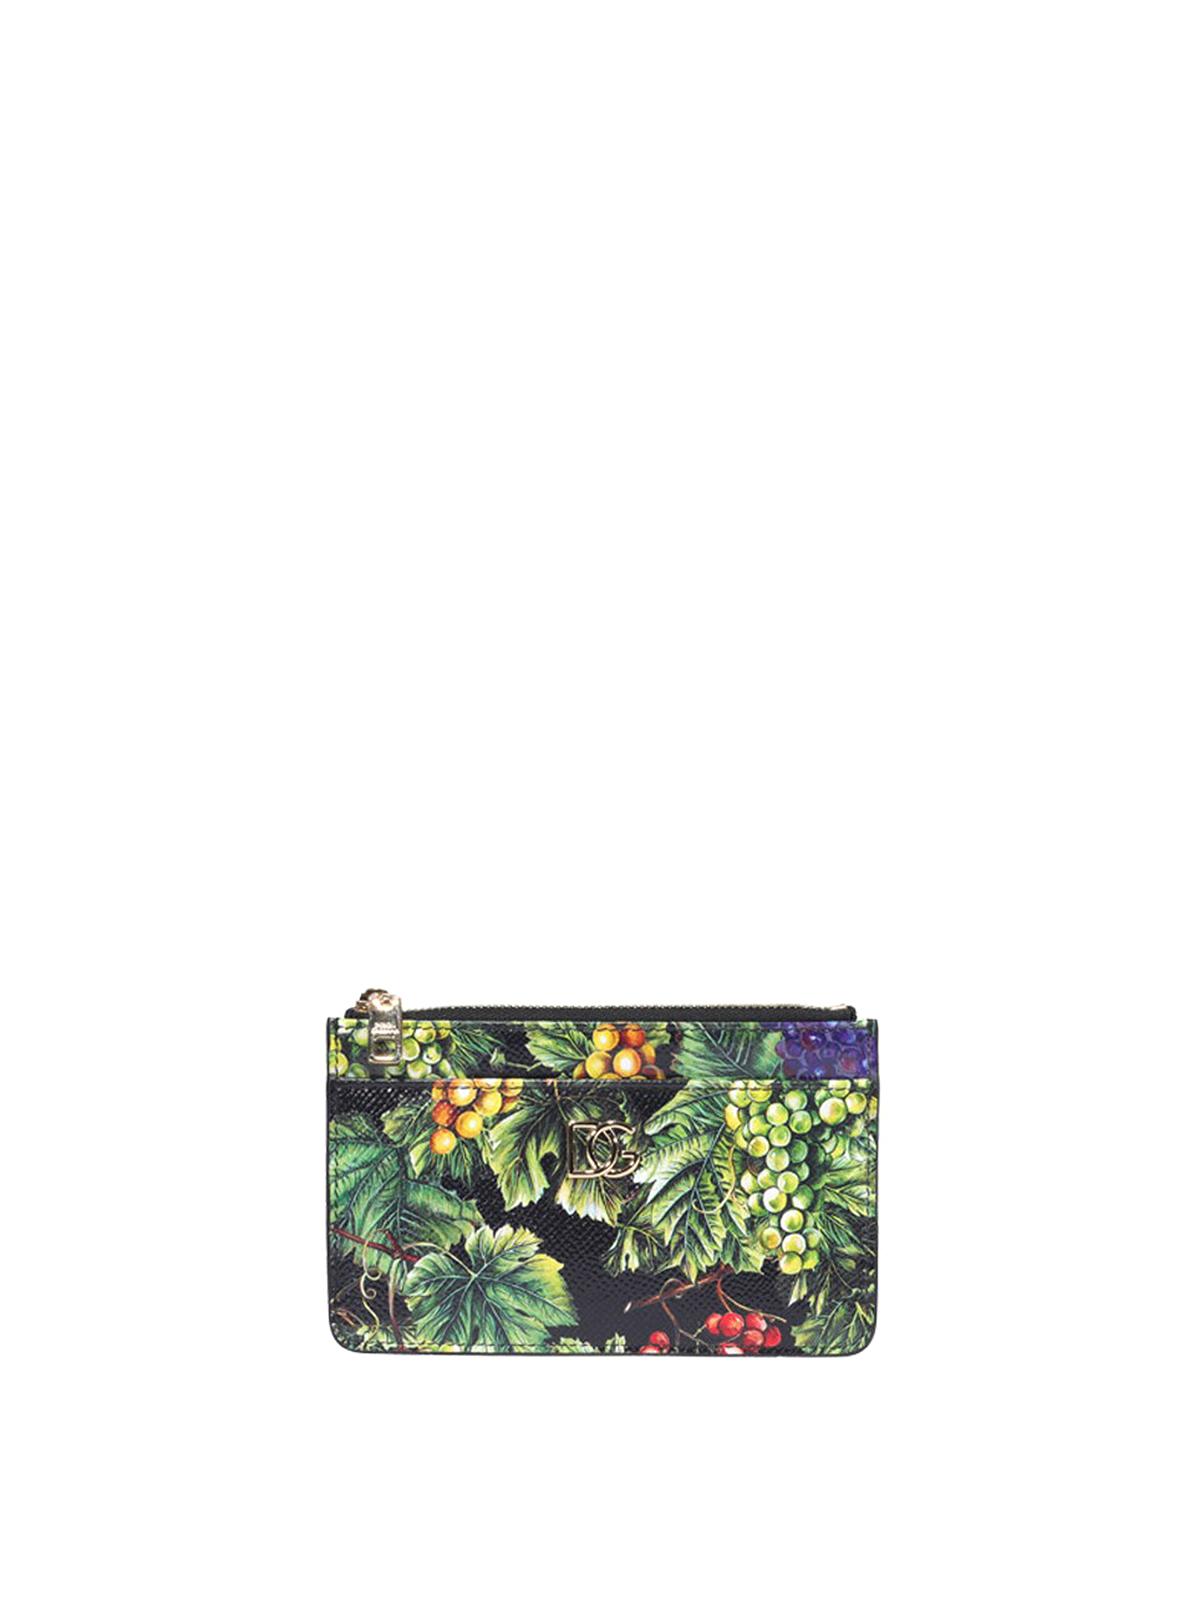 Dolce & Gabbana PRINTED WALLET